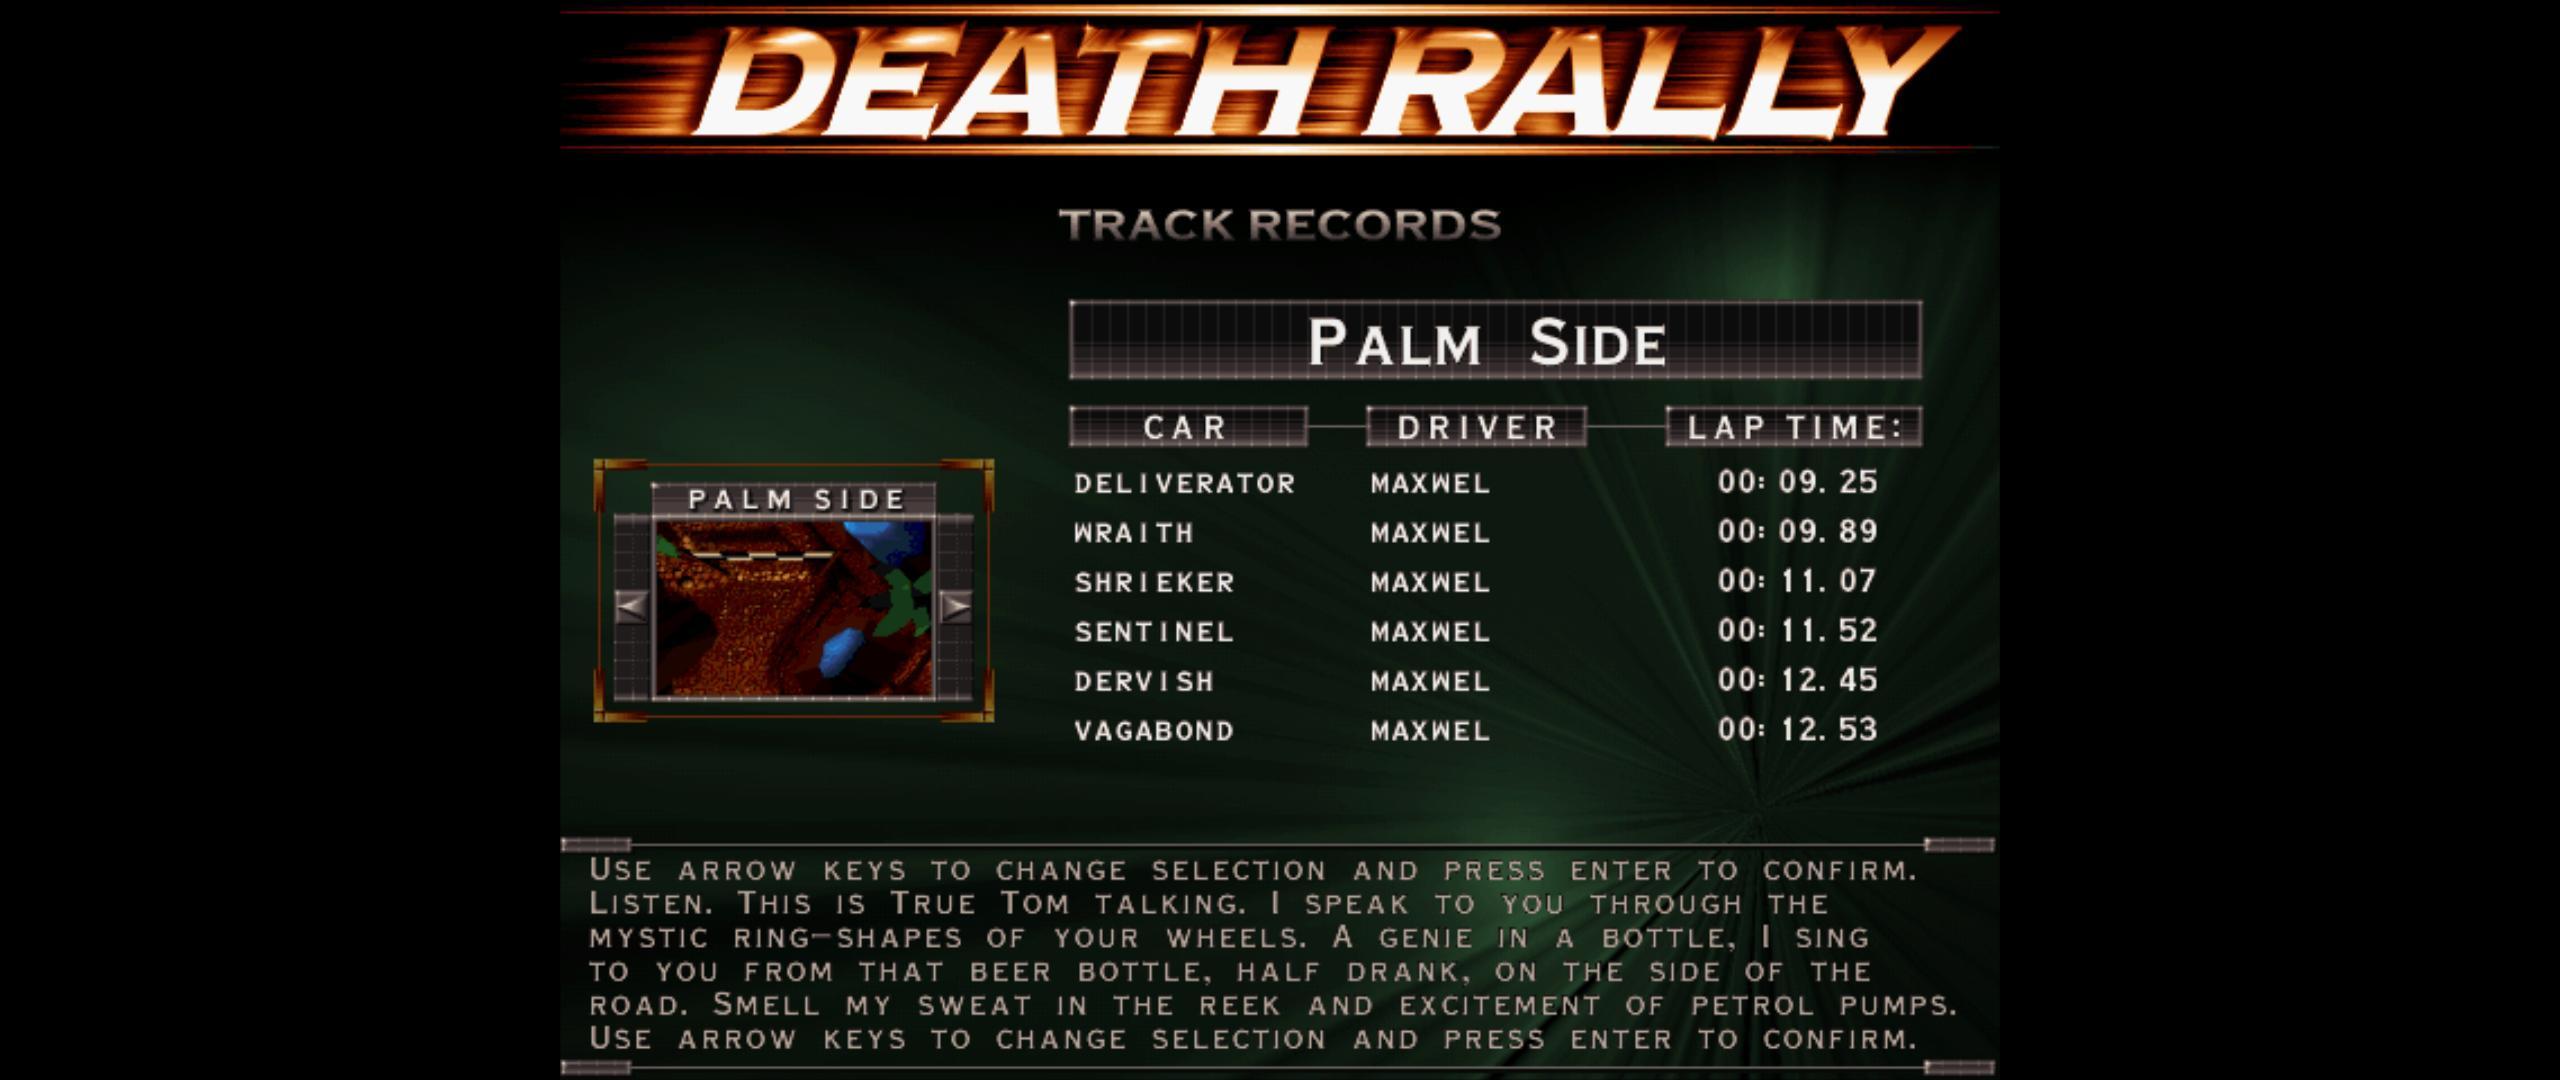 Maxwel: Death Rally [Palm Side, Shrieker Car] (PC) 0:00:11.07 points on 2016-03-04 06:45:22